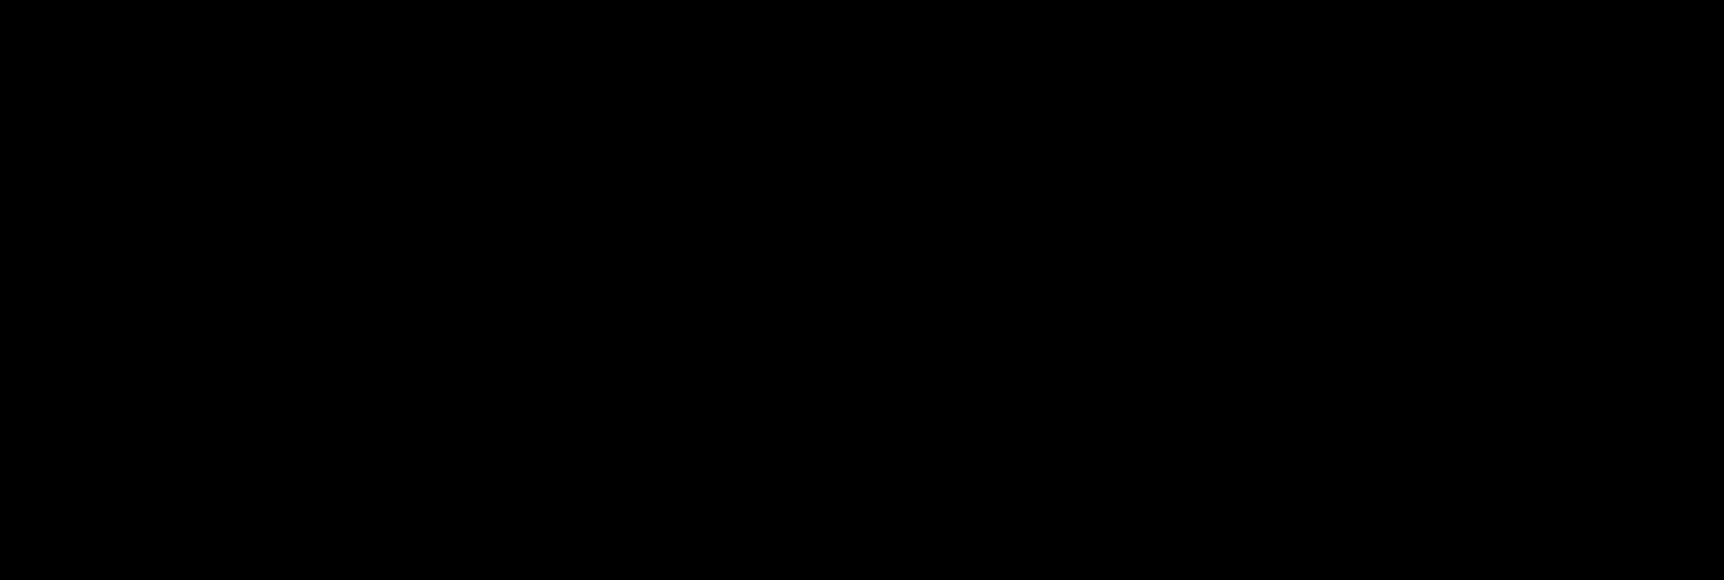 image69.png